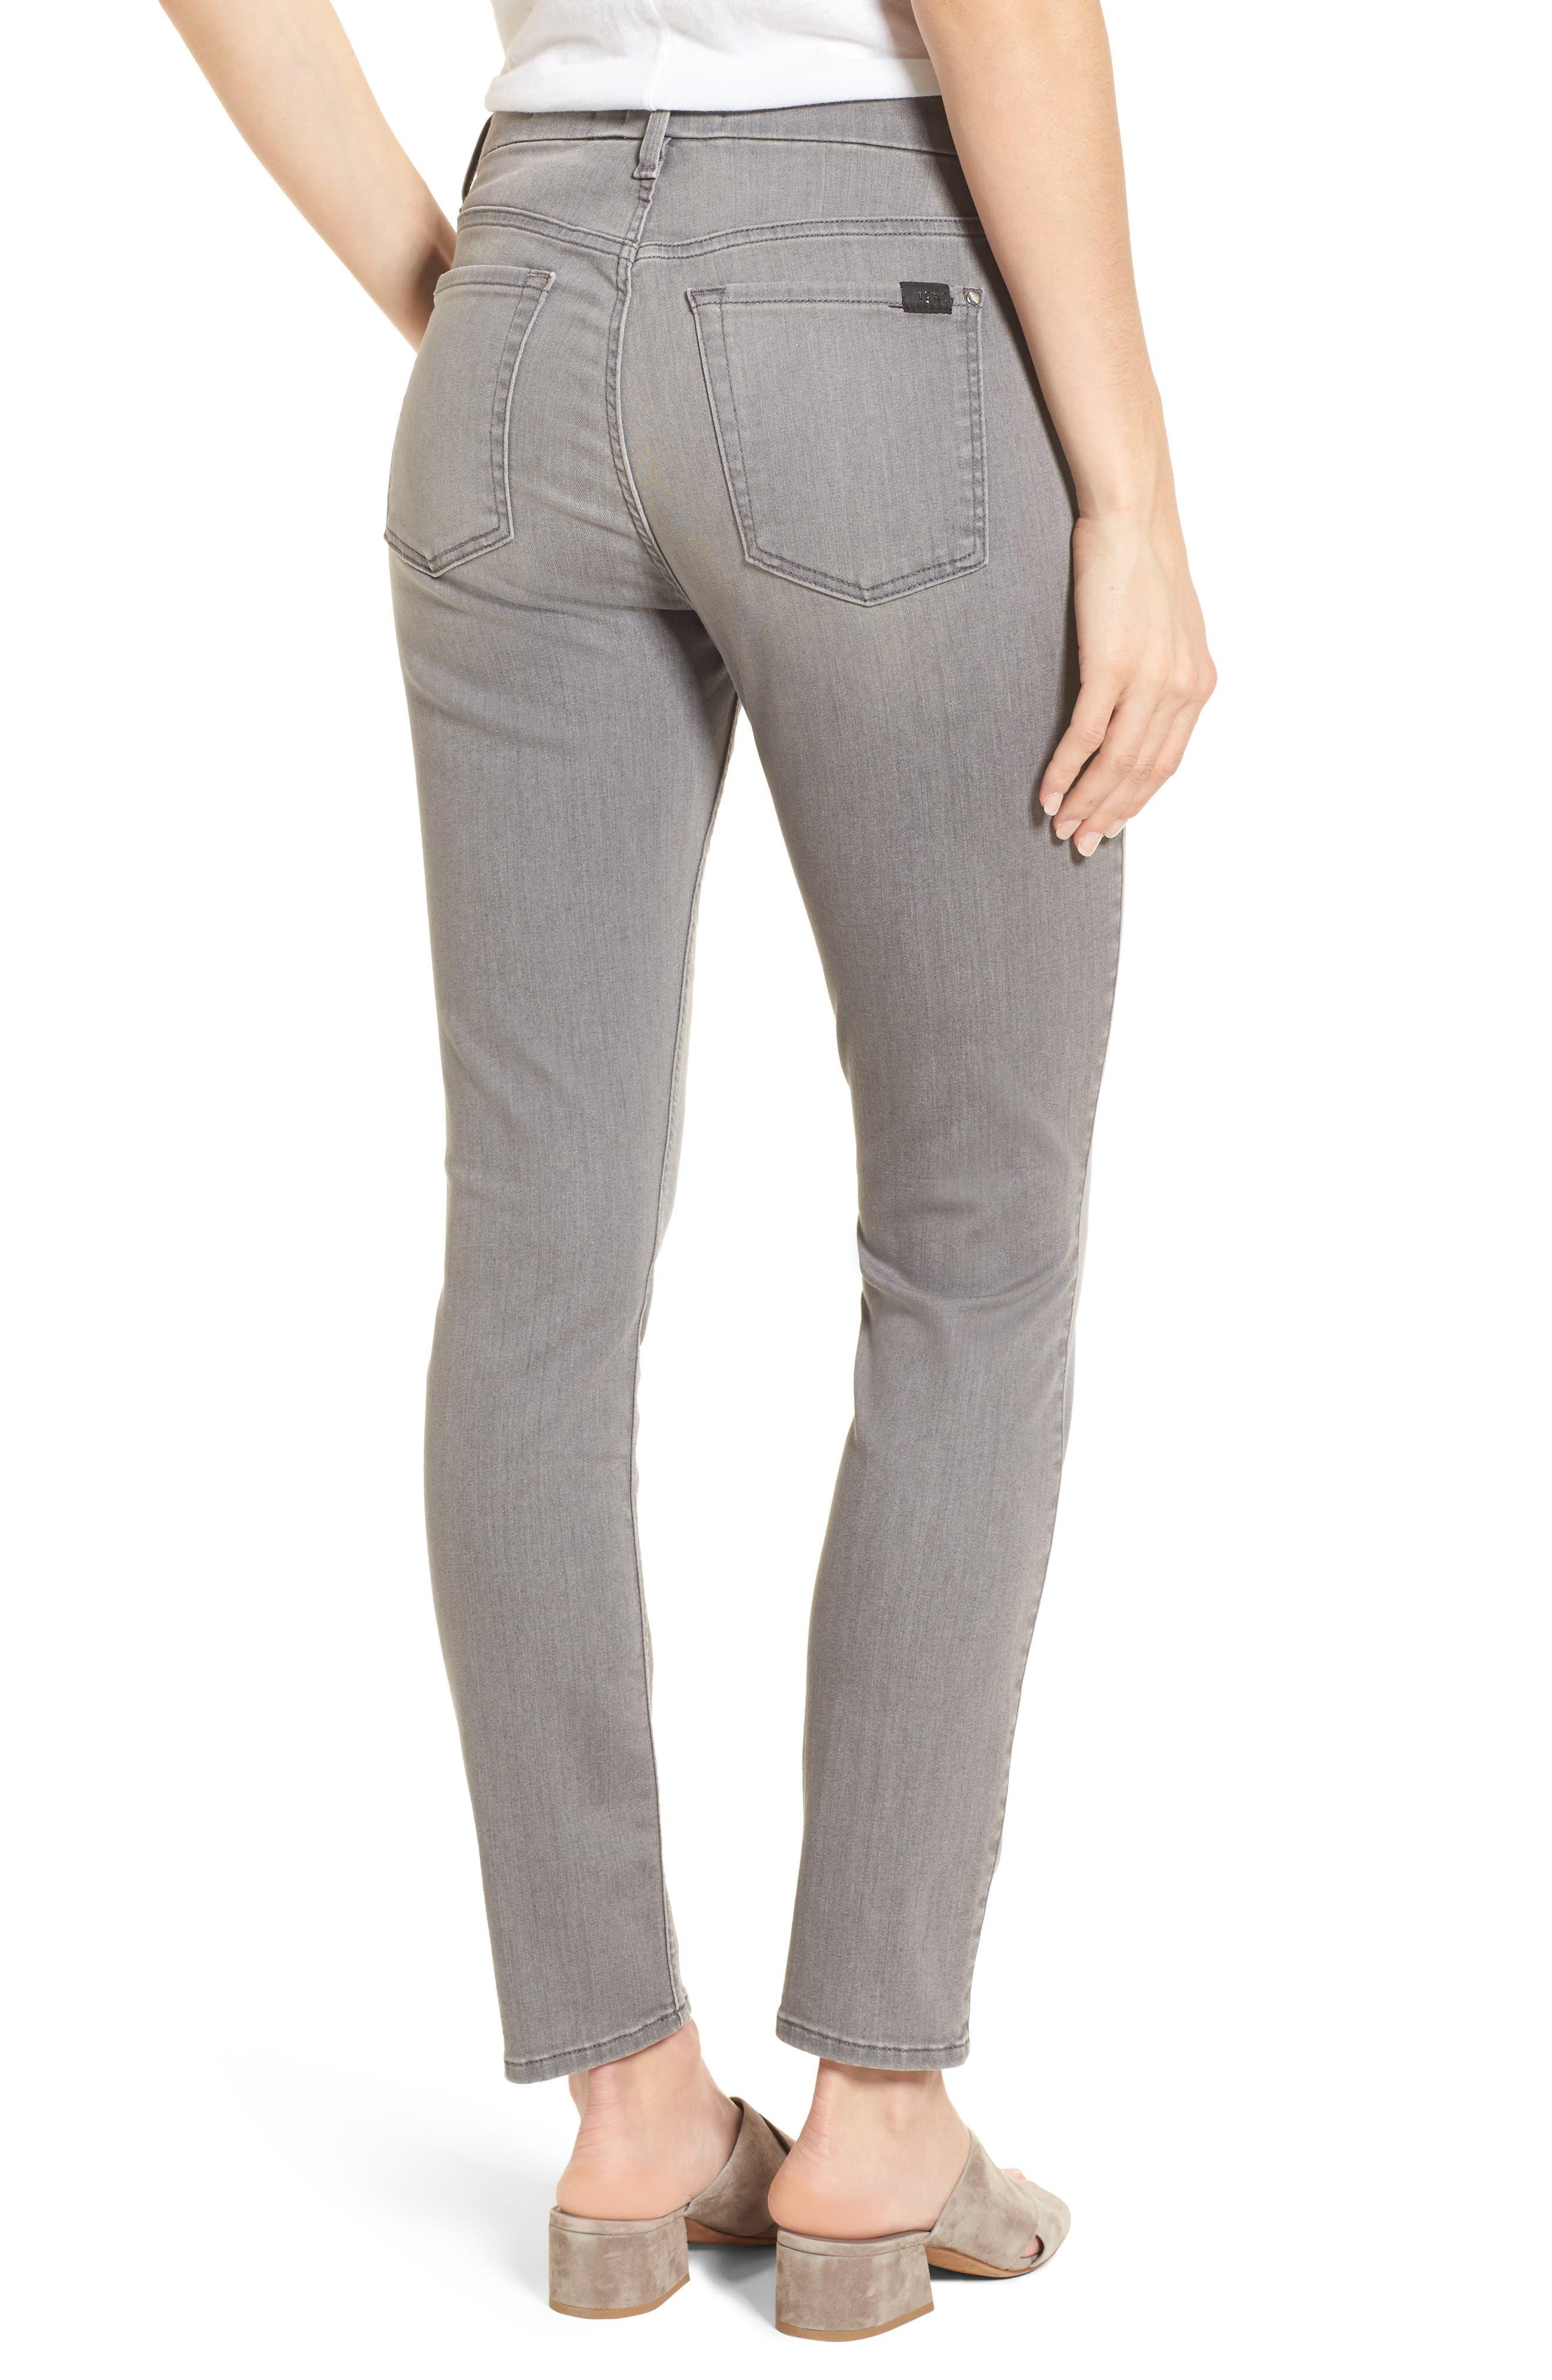 Stretch Ankle Skinny Jeans by Jen7